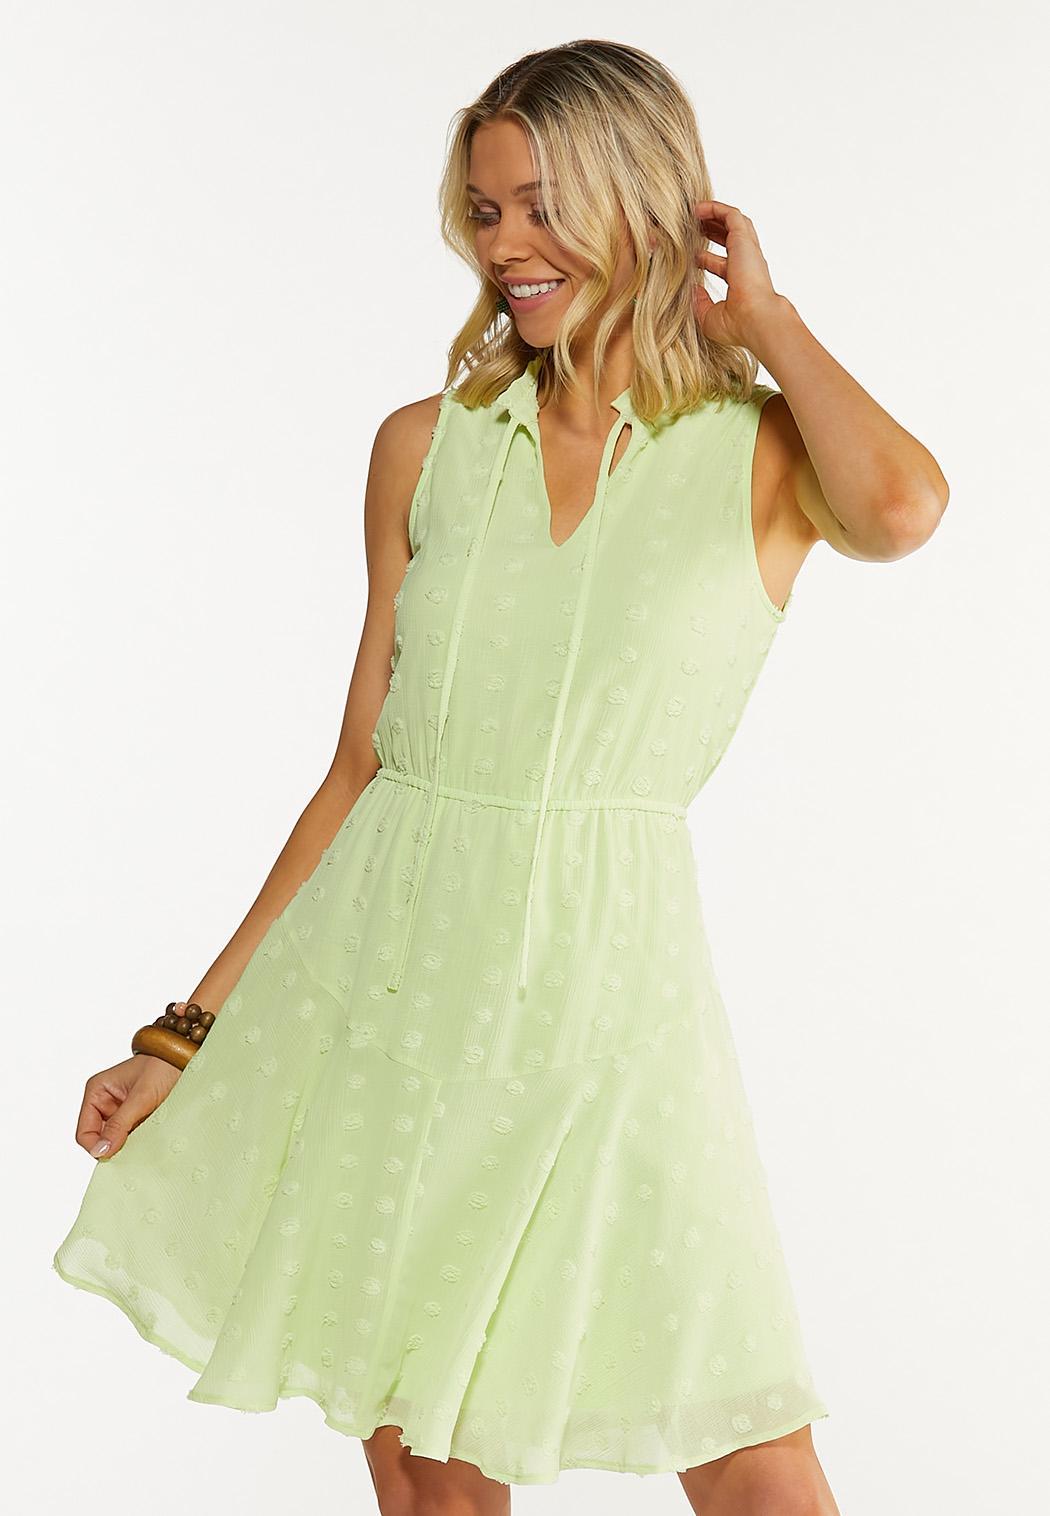 Tiered Textured Dress